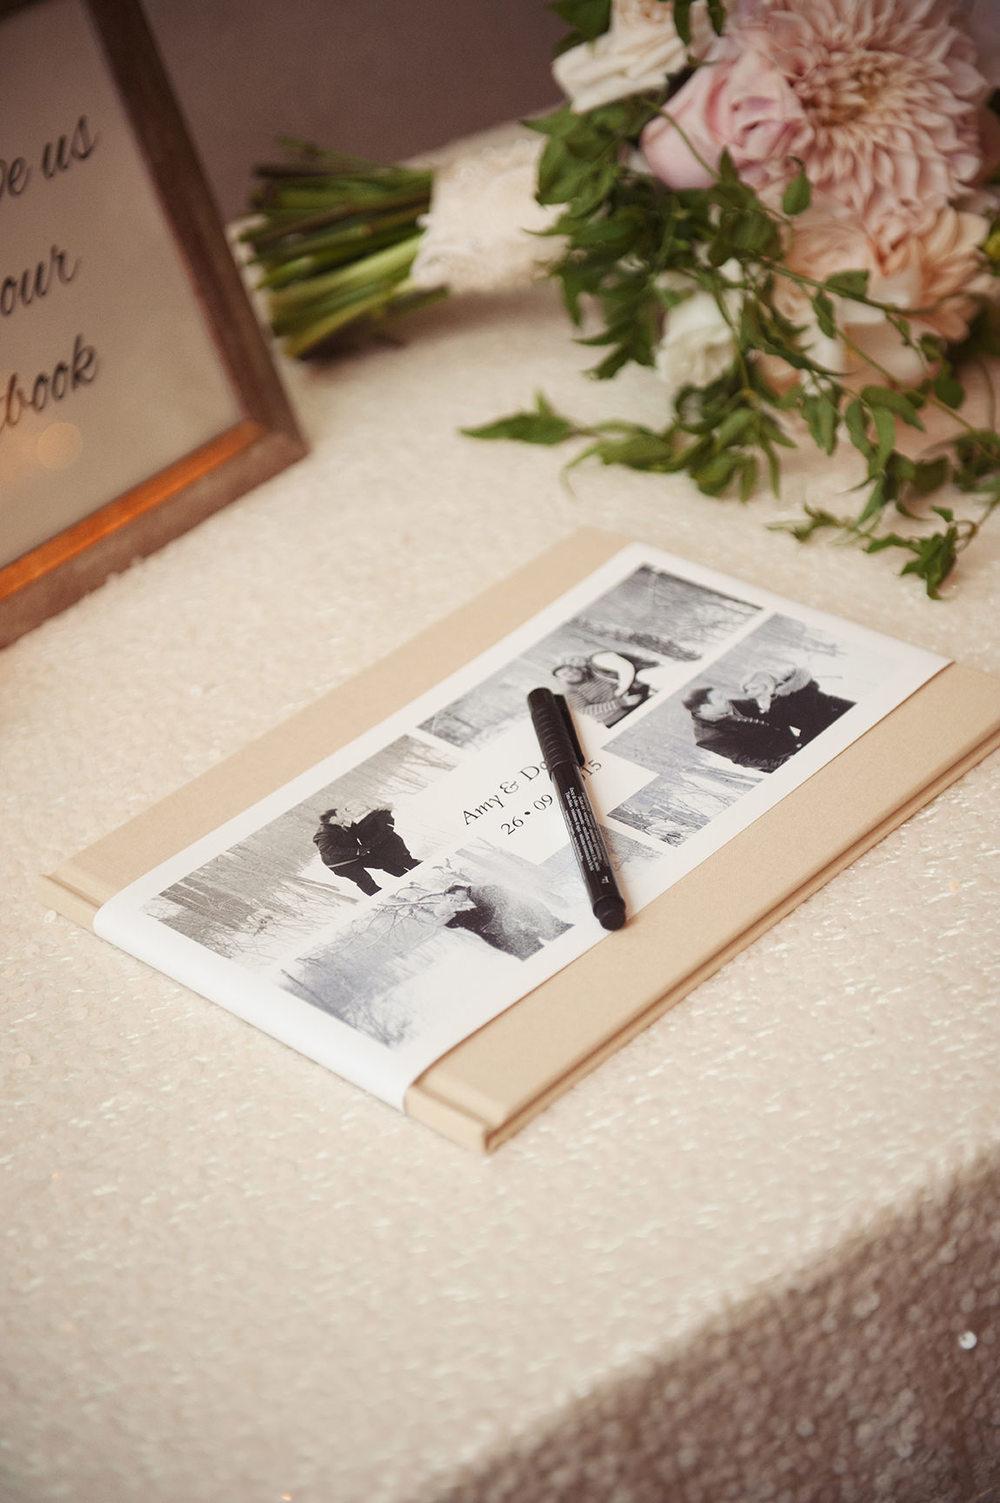 St-Catharines-Wedding-Stone-Mill-Inn-Amy-Darryl-photography-by-Morgan-Falk-099.JPG